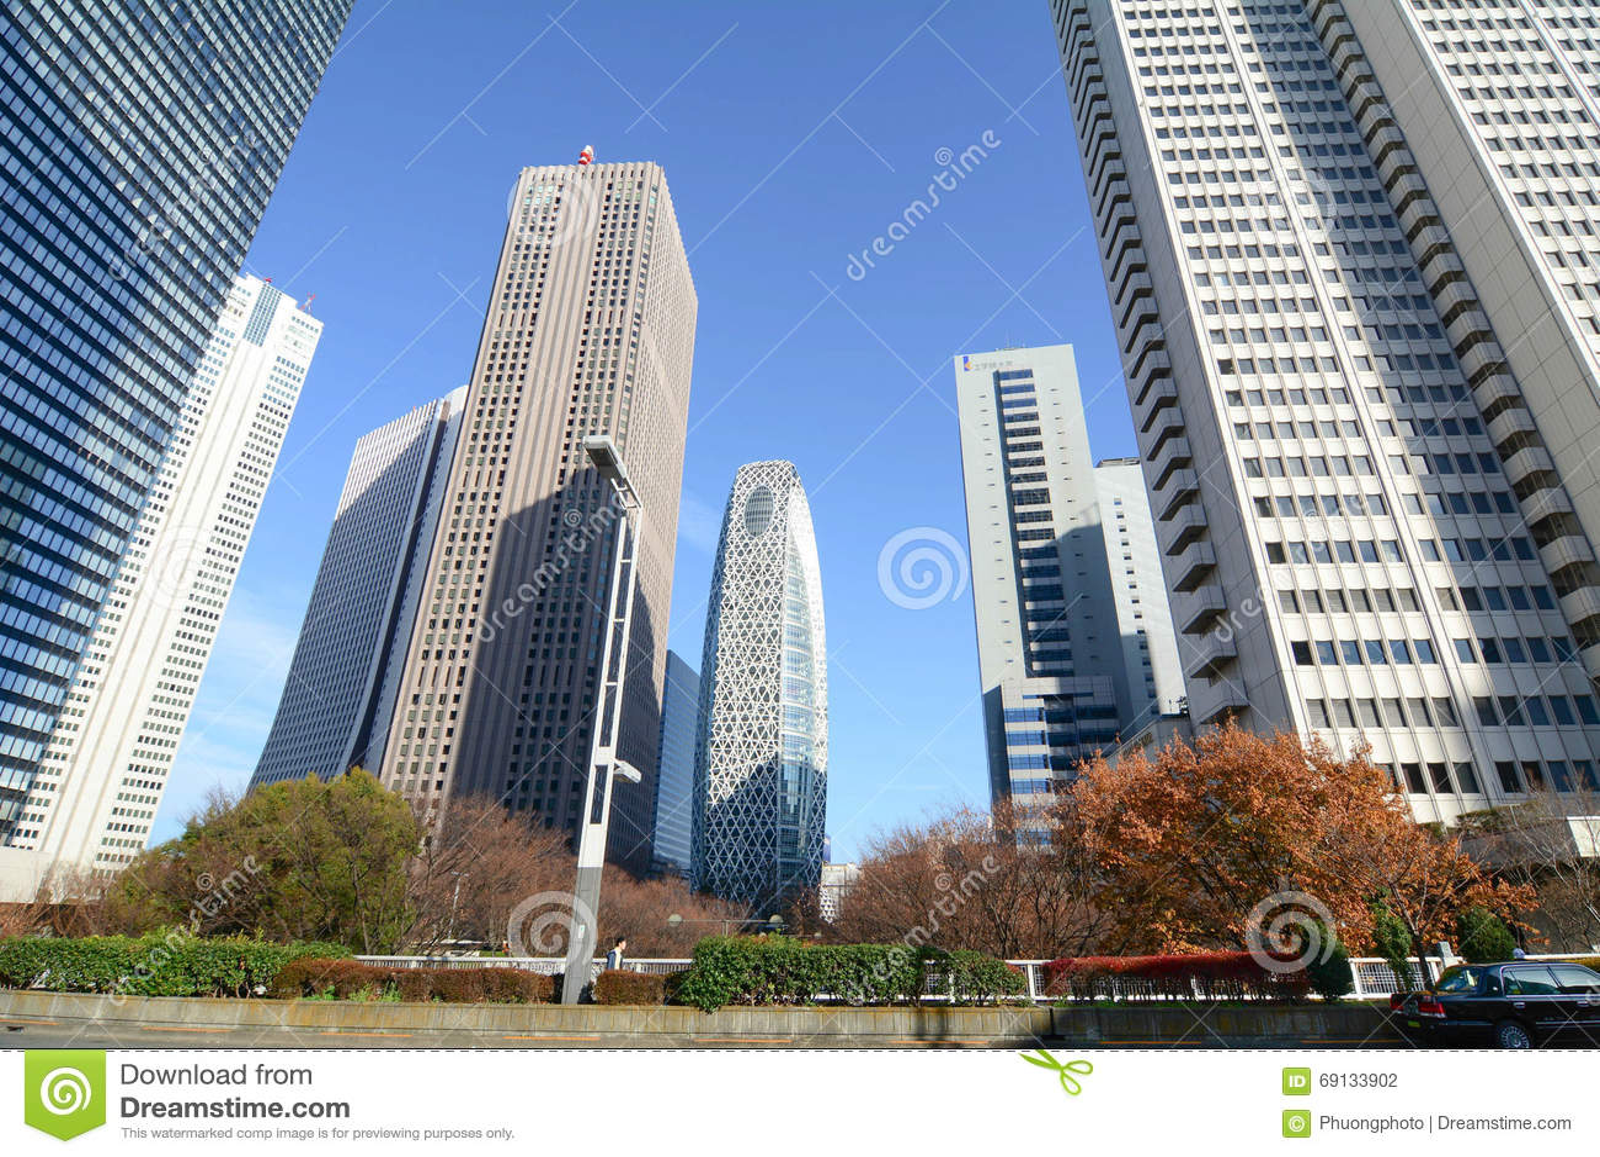 Hohe Gebäude in Shinjuku, Tokyo, Japan